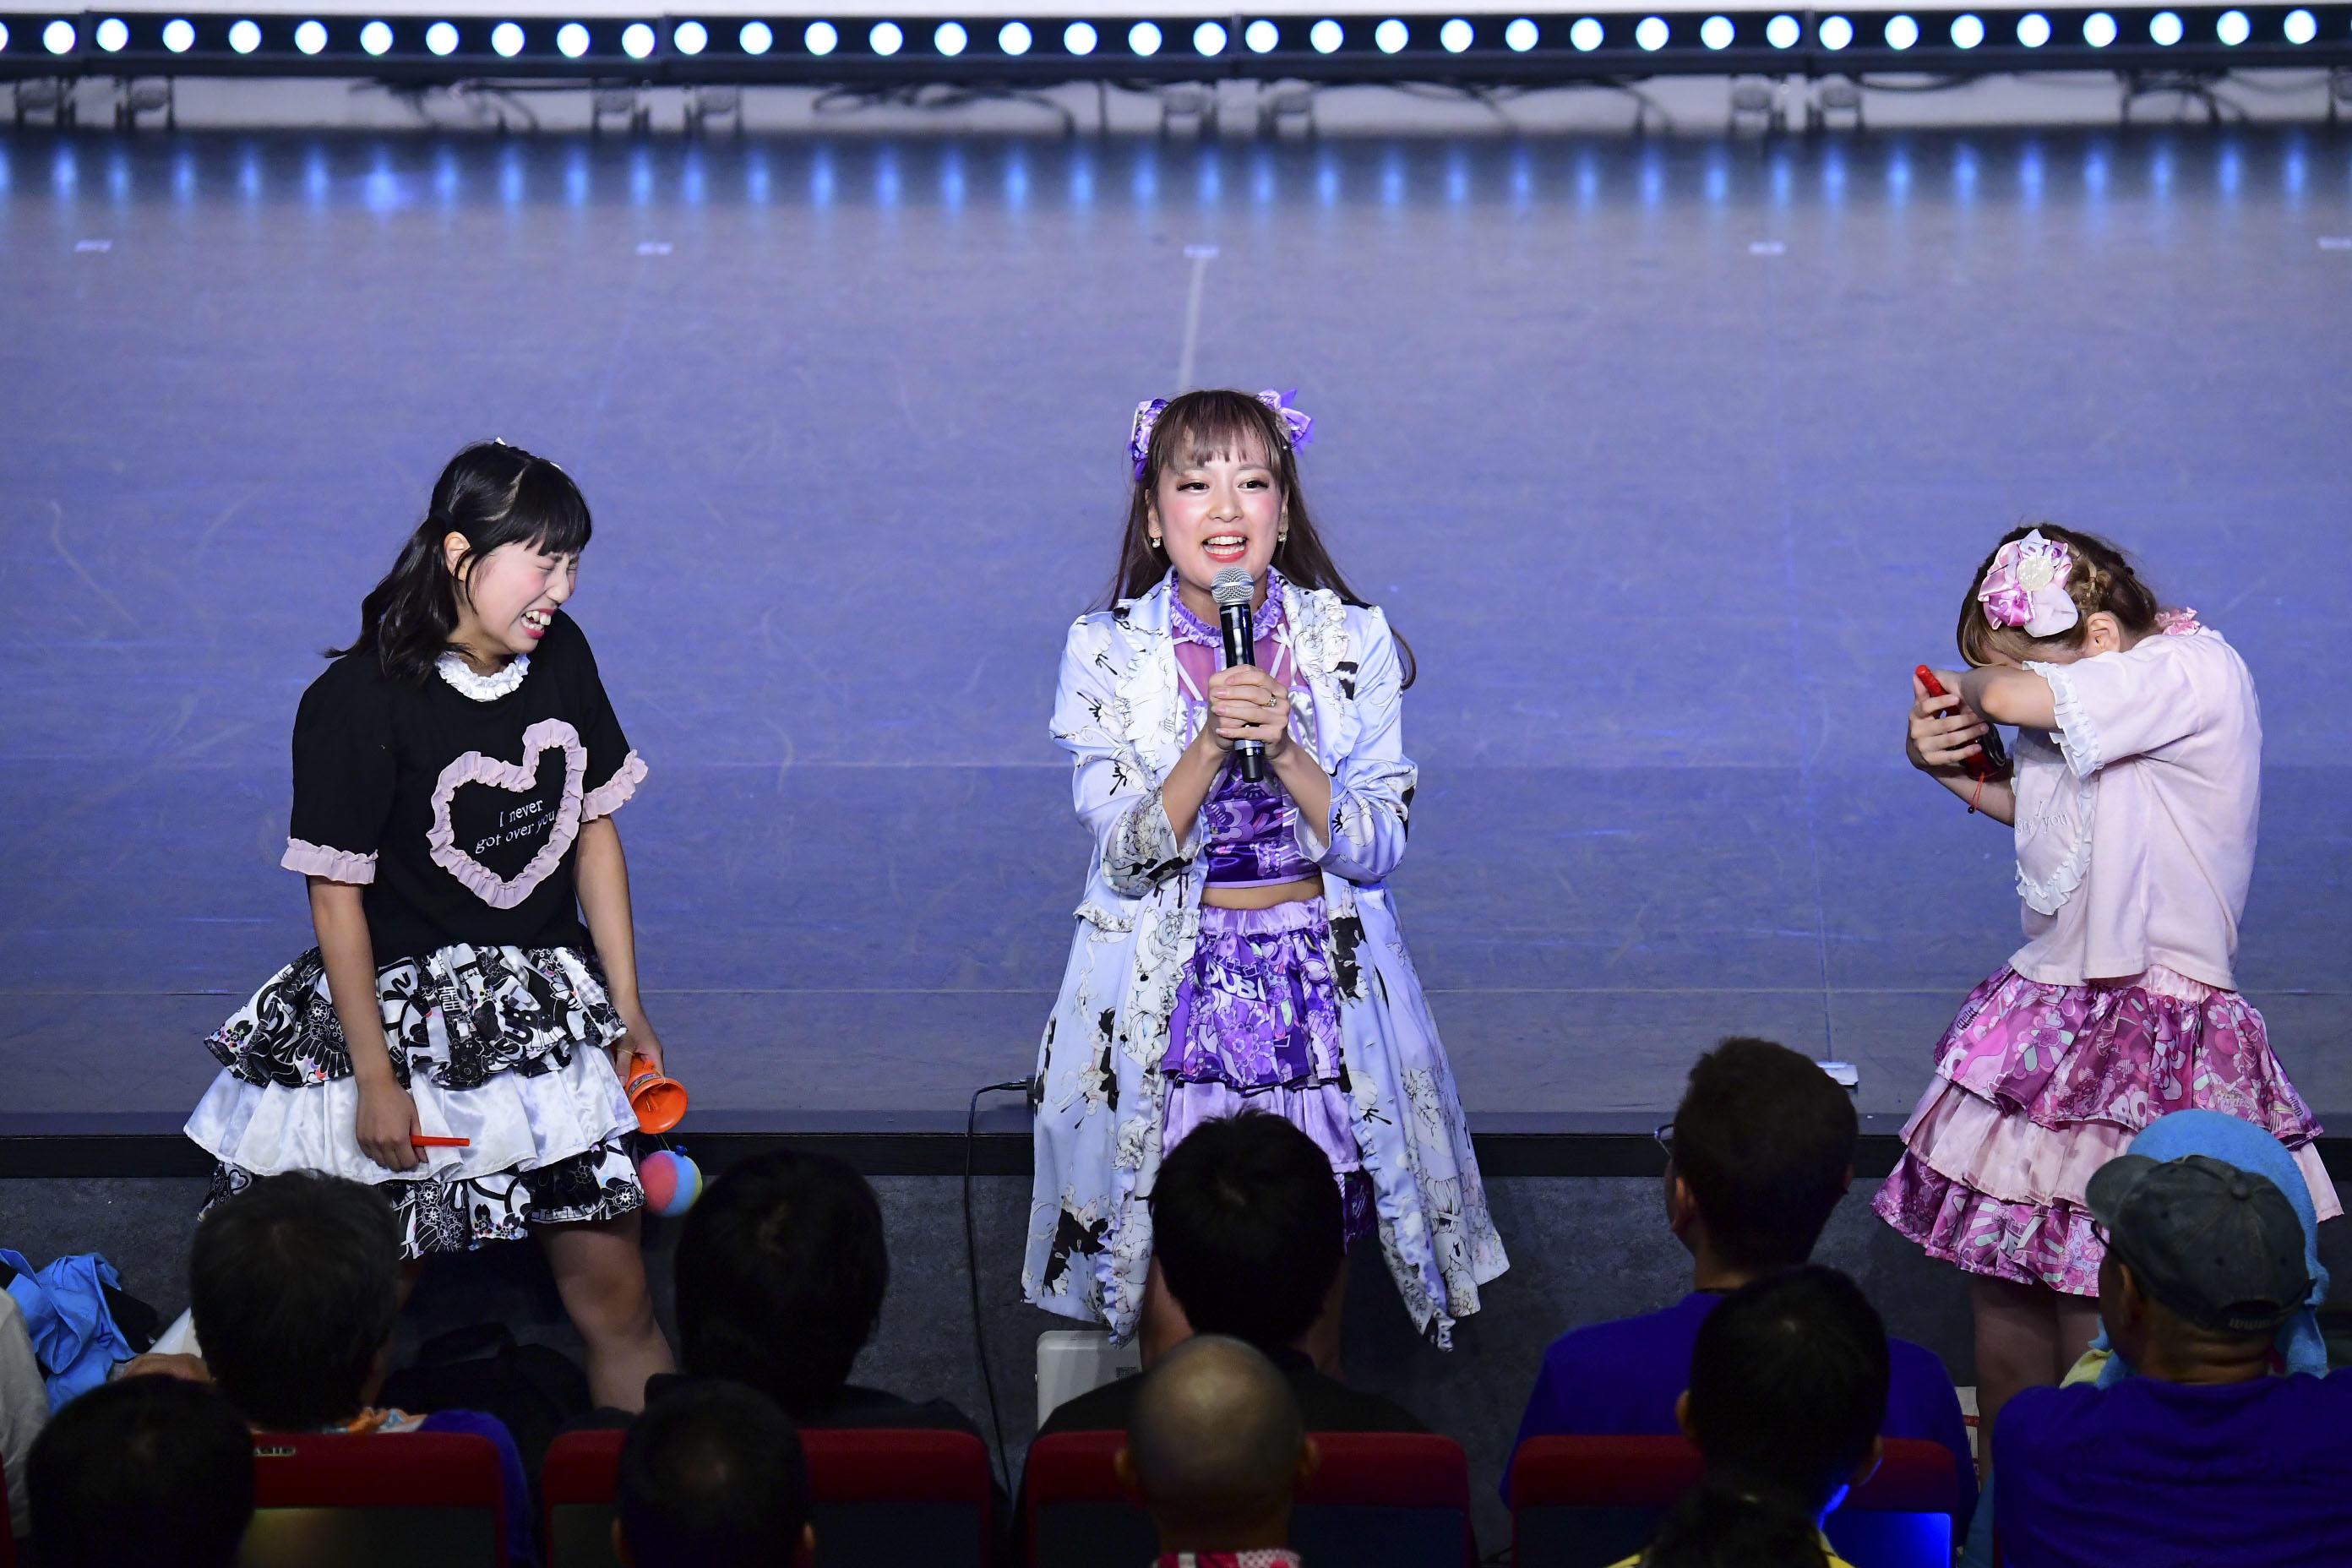 http://news.yoshimoto.co.jp/20170911120715-053cedd341c296740f385cacebfe864033d04217.jpg